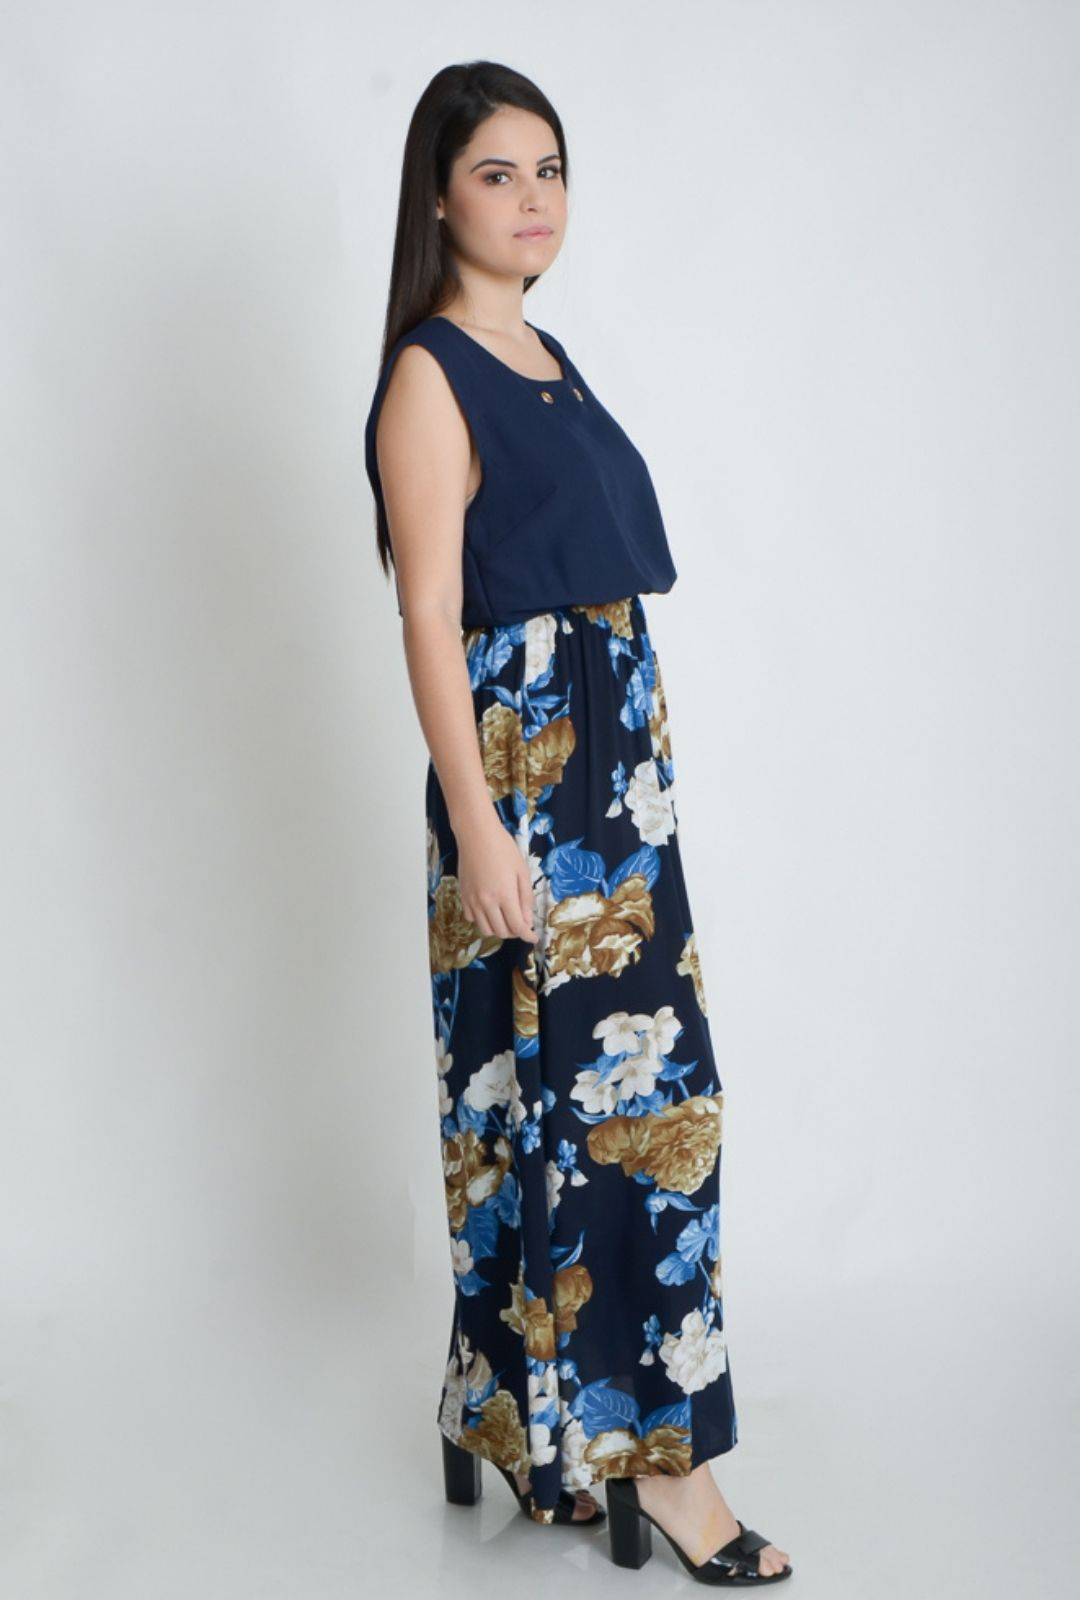 Vestido Longo Regata com Colar  - ModaStore | Moda Feminina